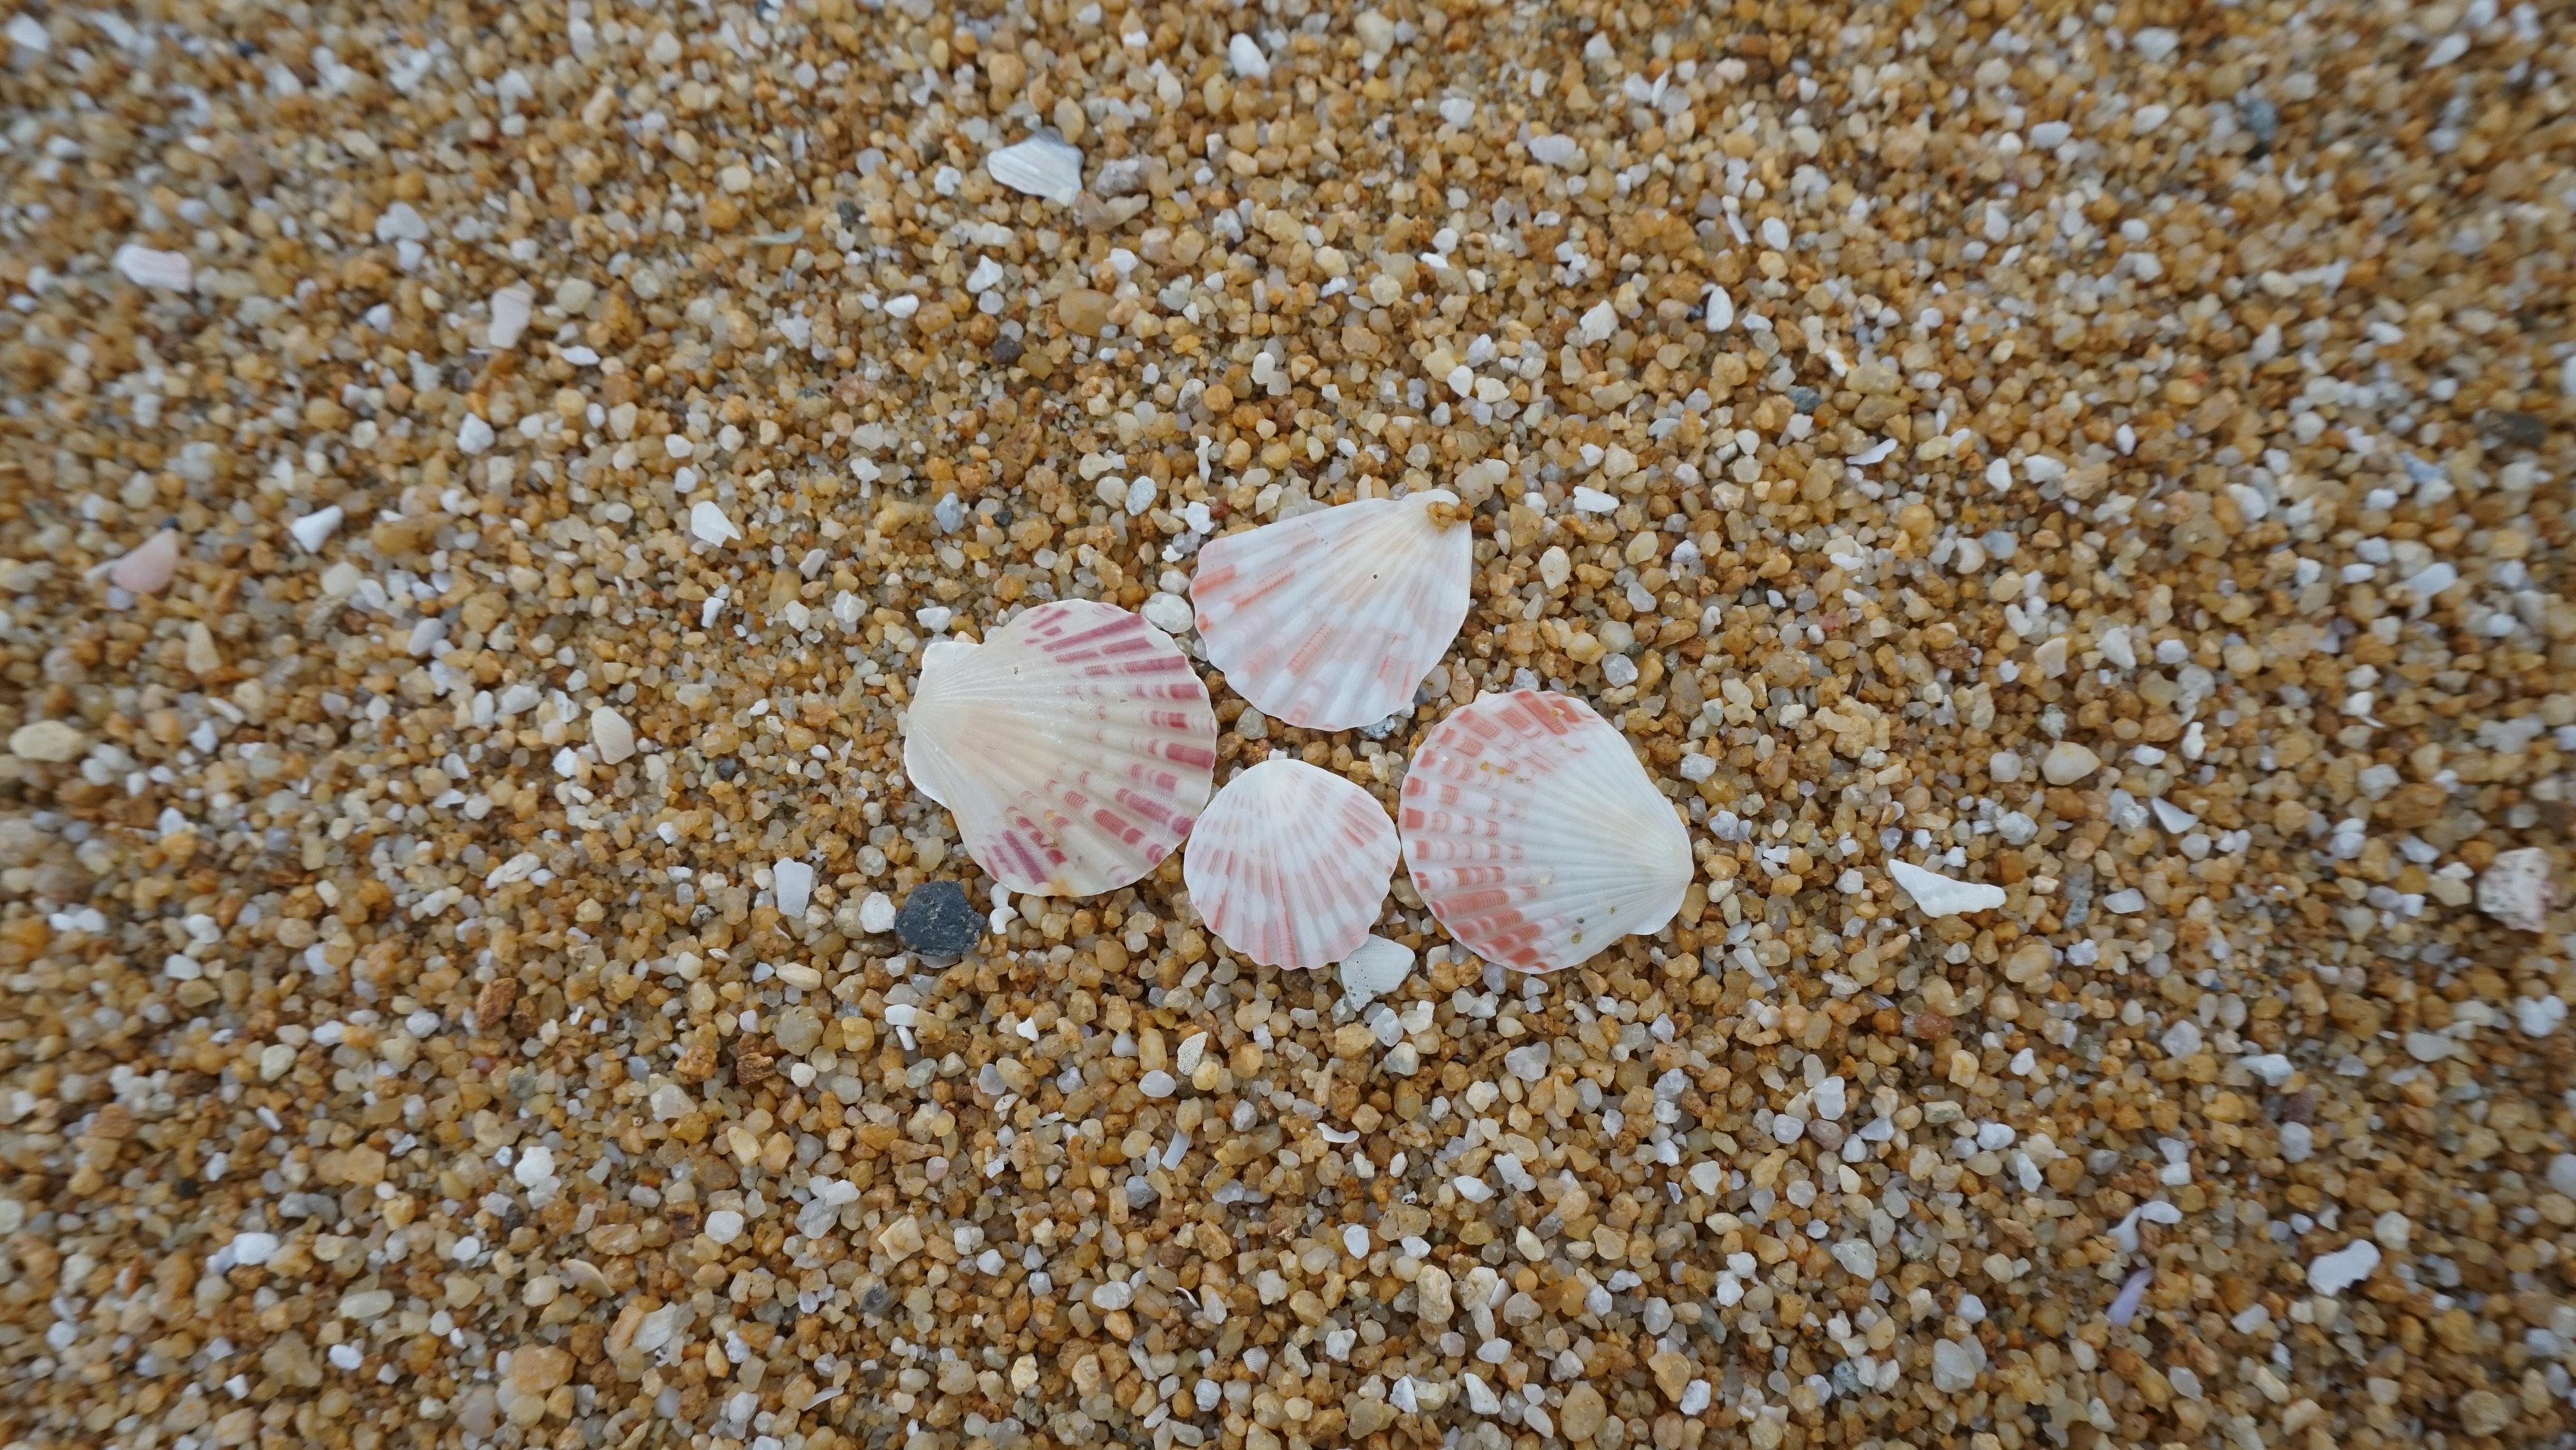 Shells on shore photo